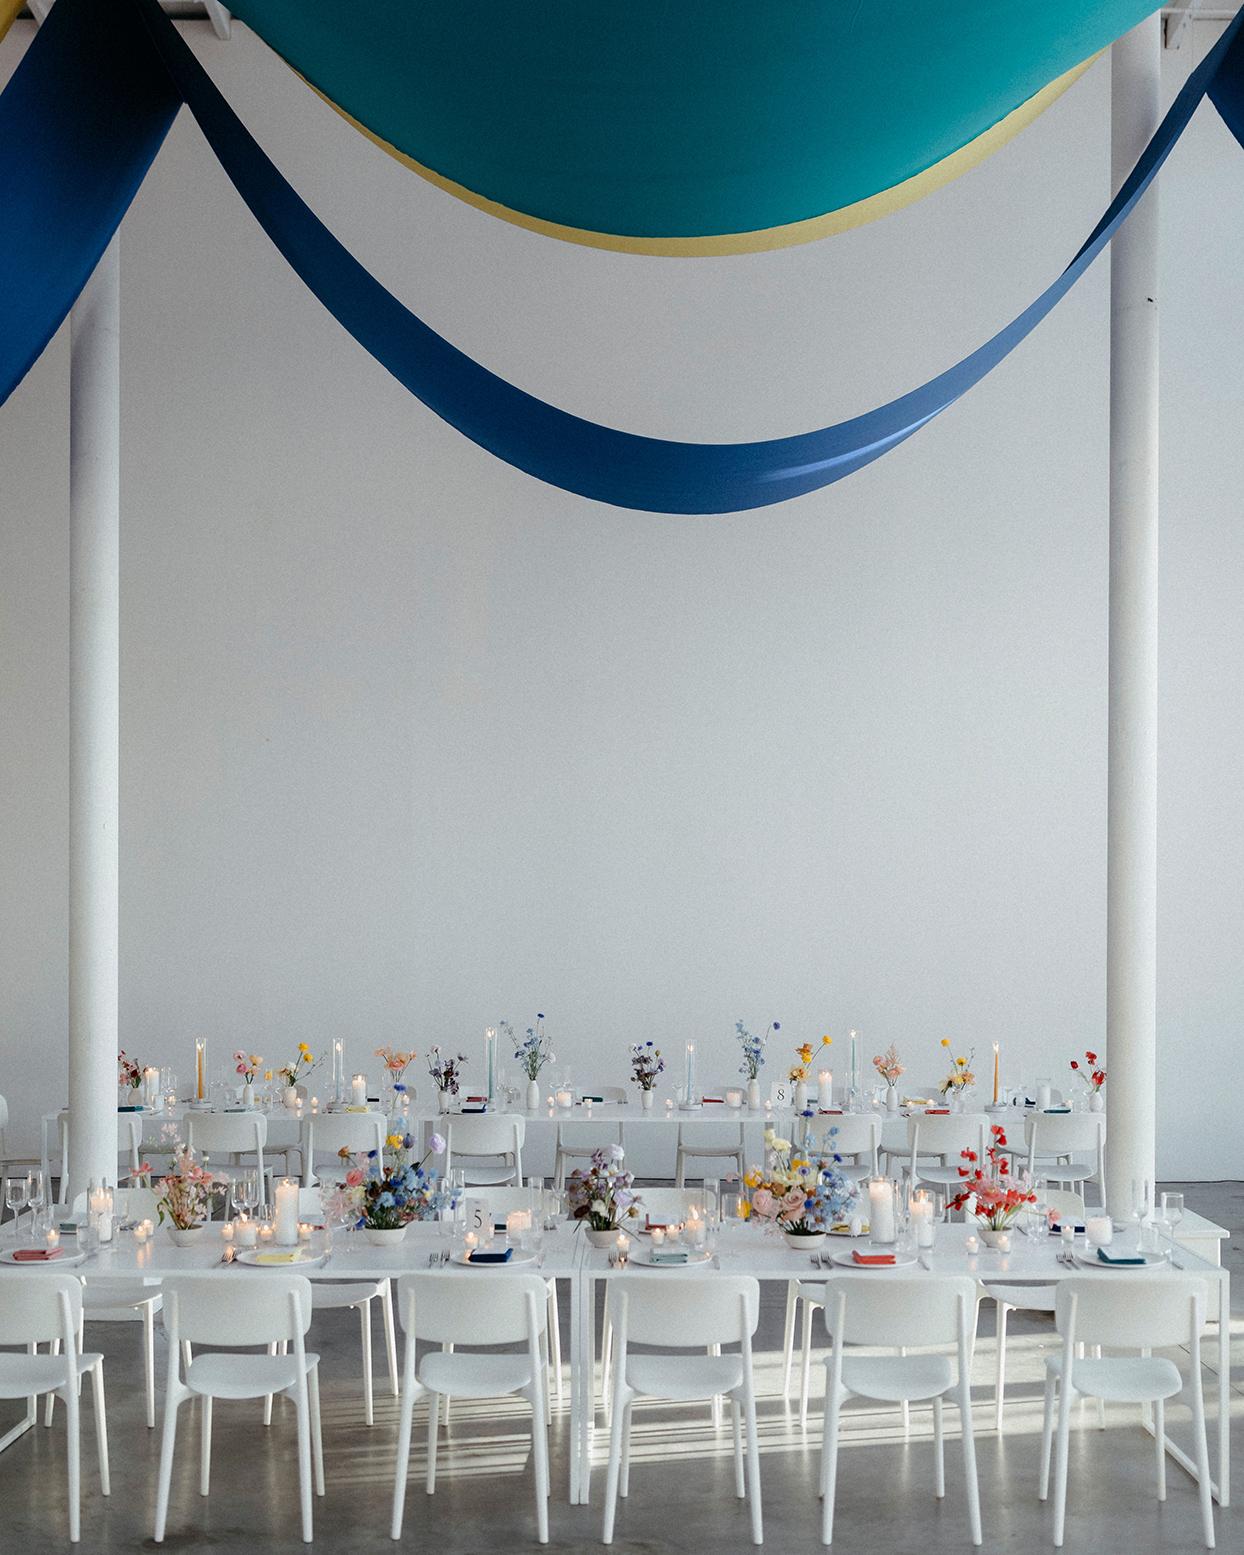 kristen jonathan wedding reception space